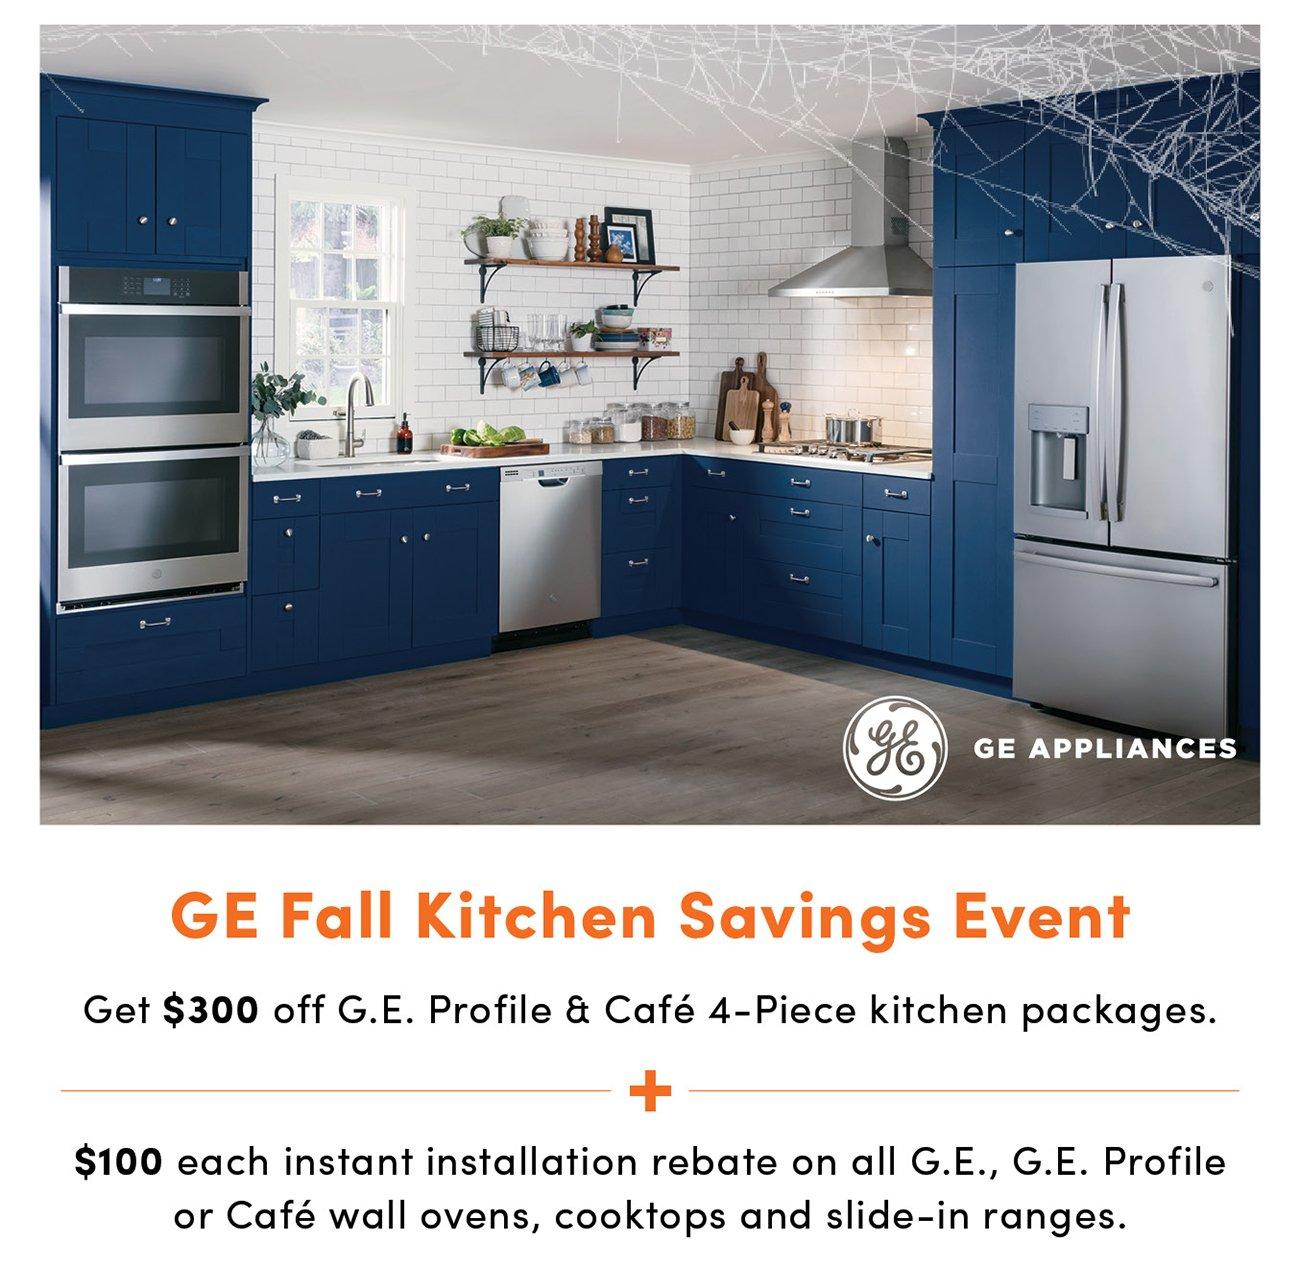 Ge-savings-event